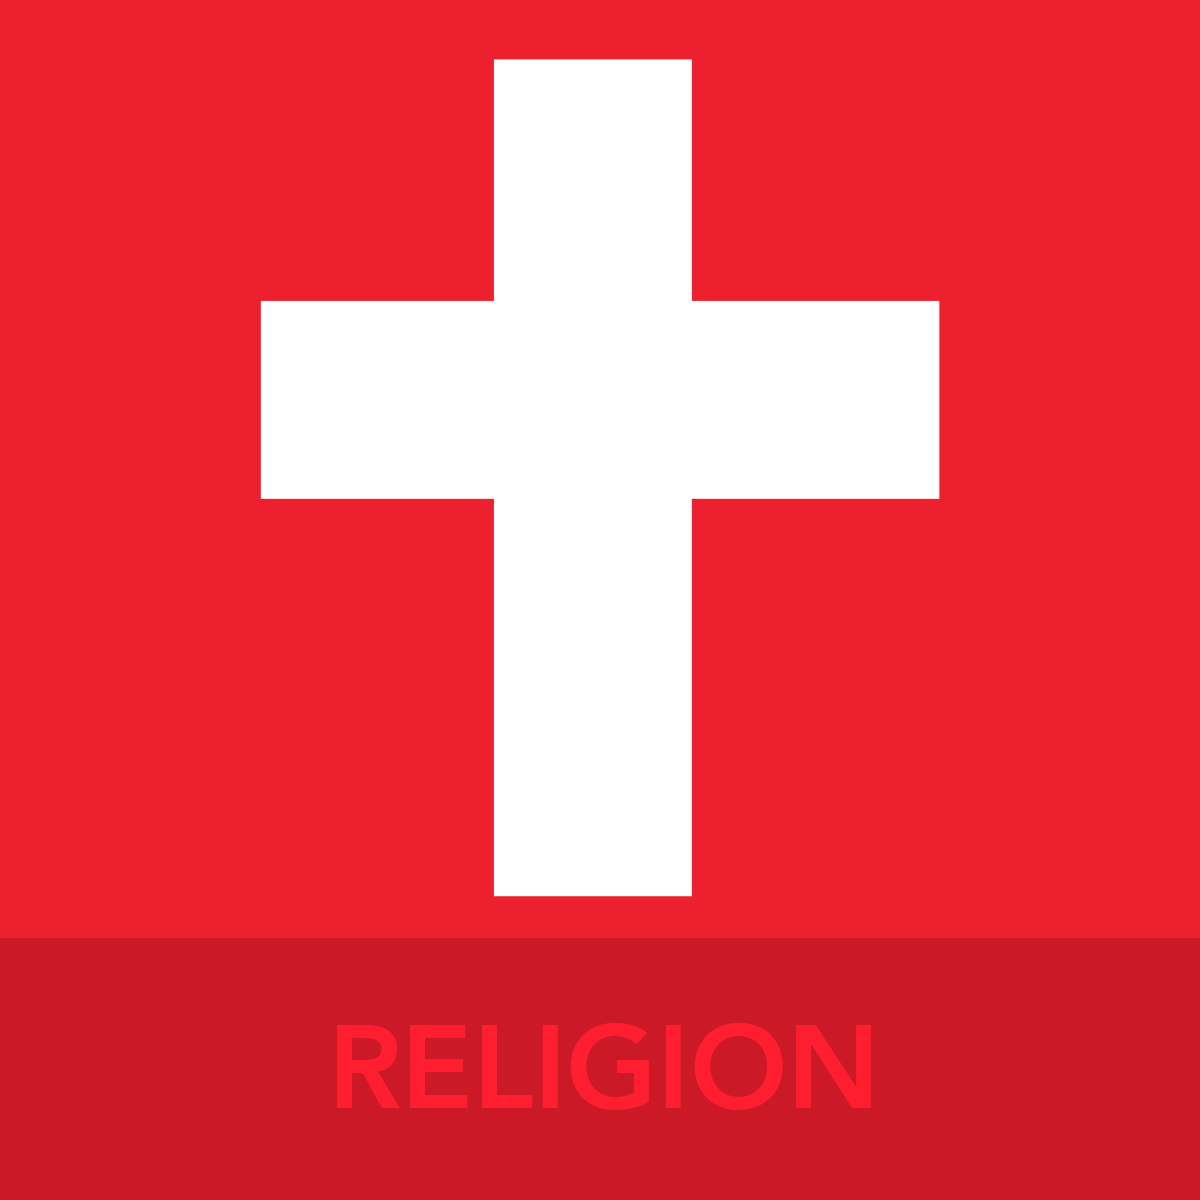 RELIGION ICON BUTTON